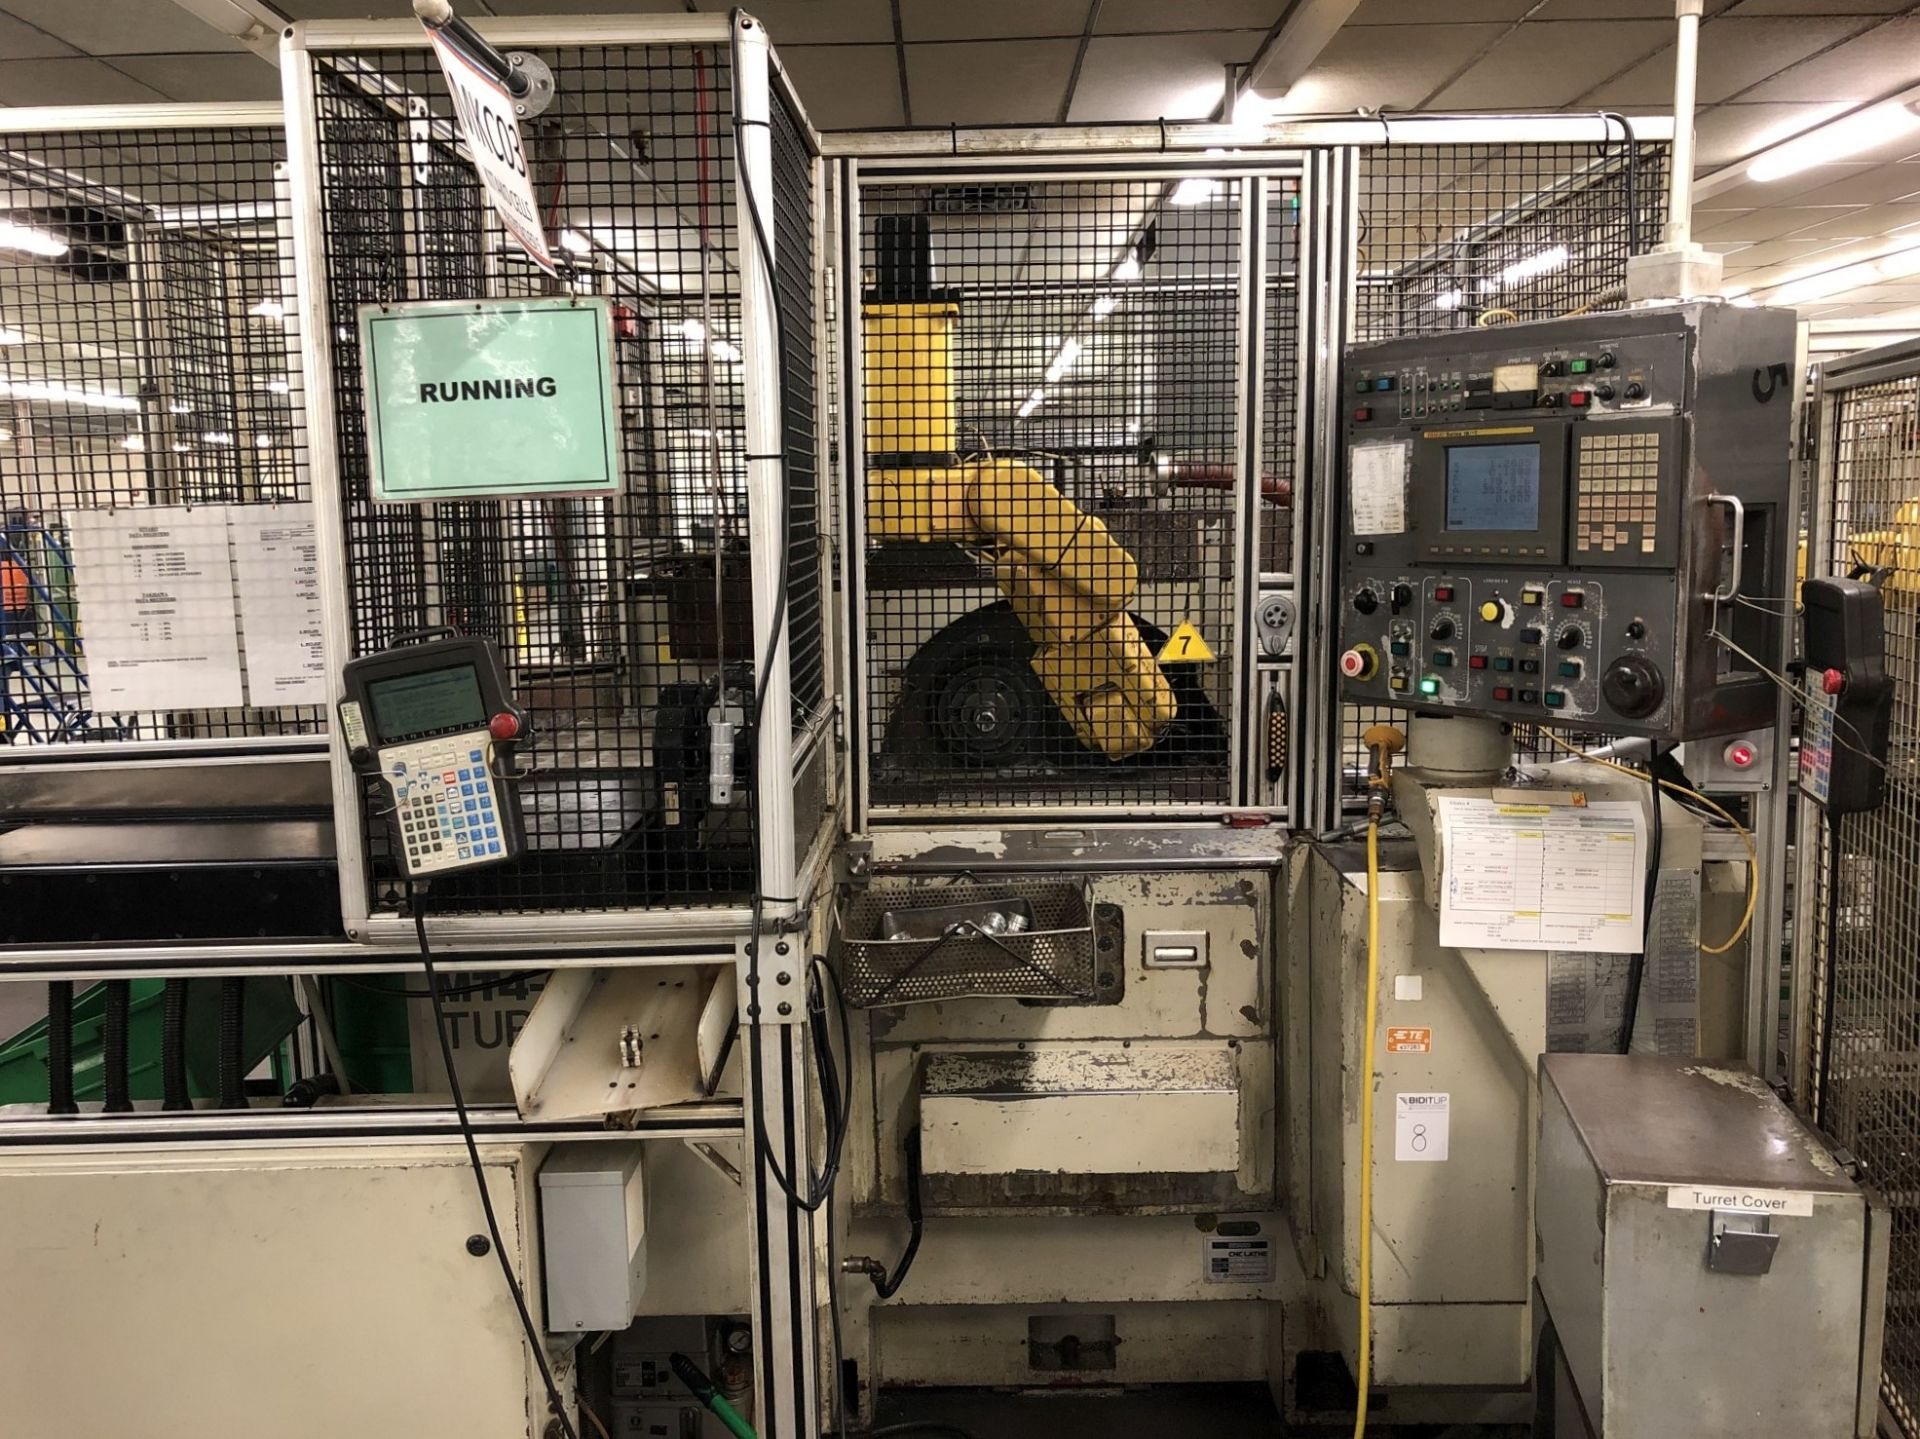 1999 Kitako MT4-200M Multi-Spindle CNC Turning Mill - Image 3 of 15